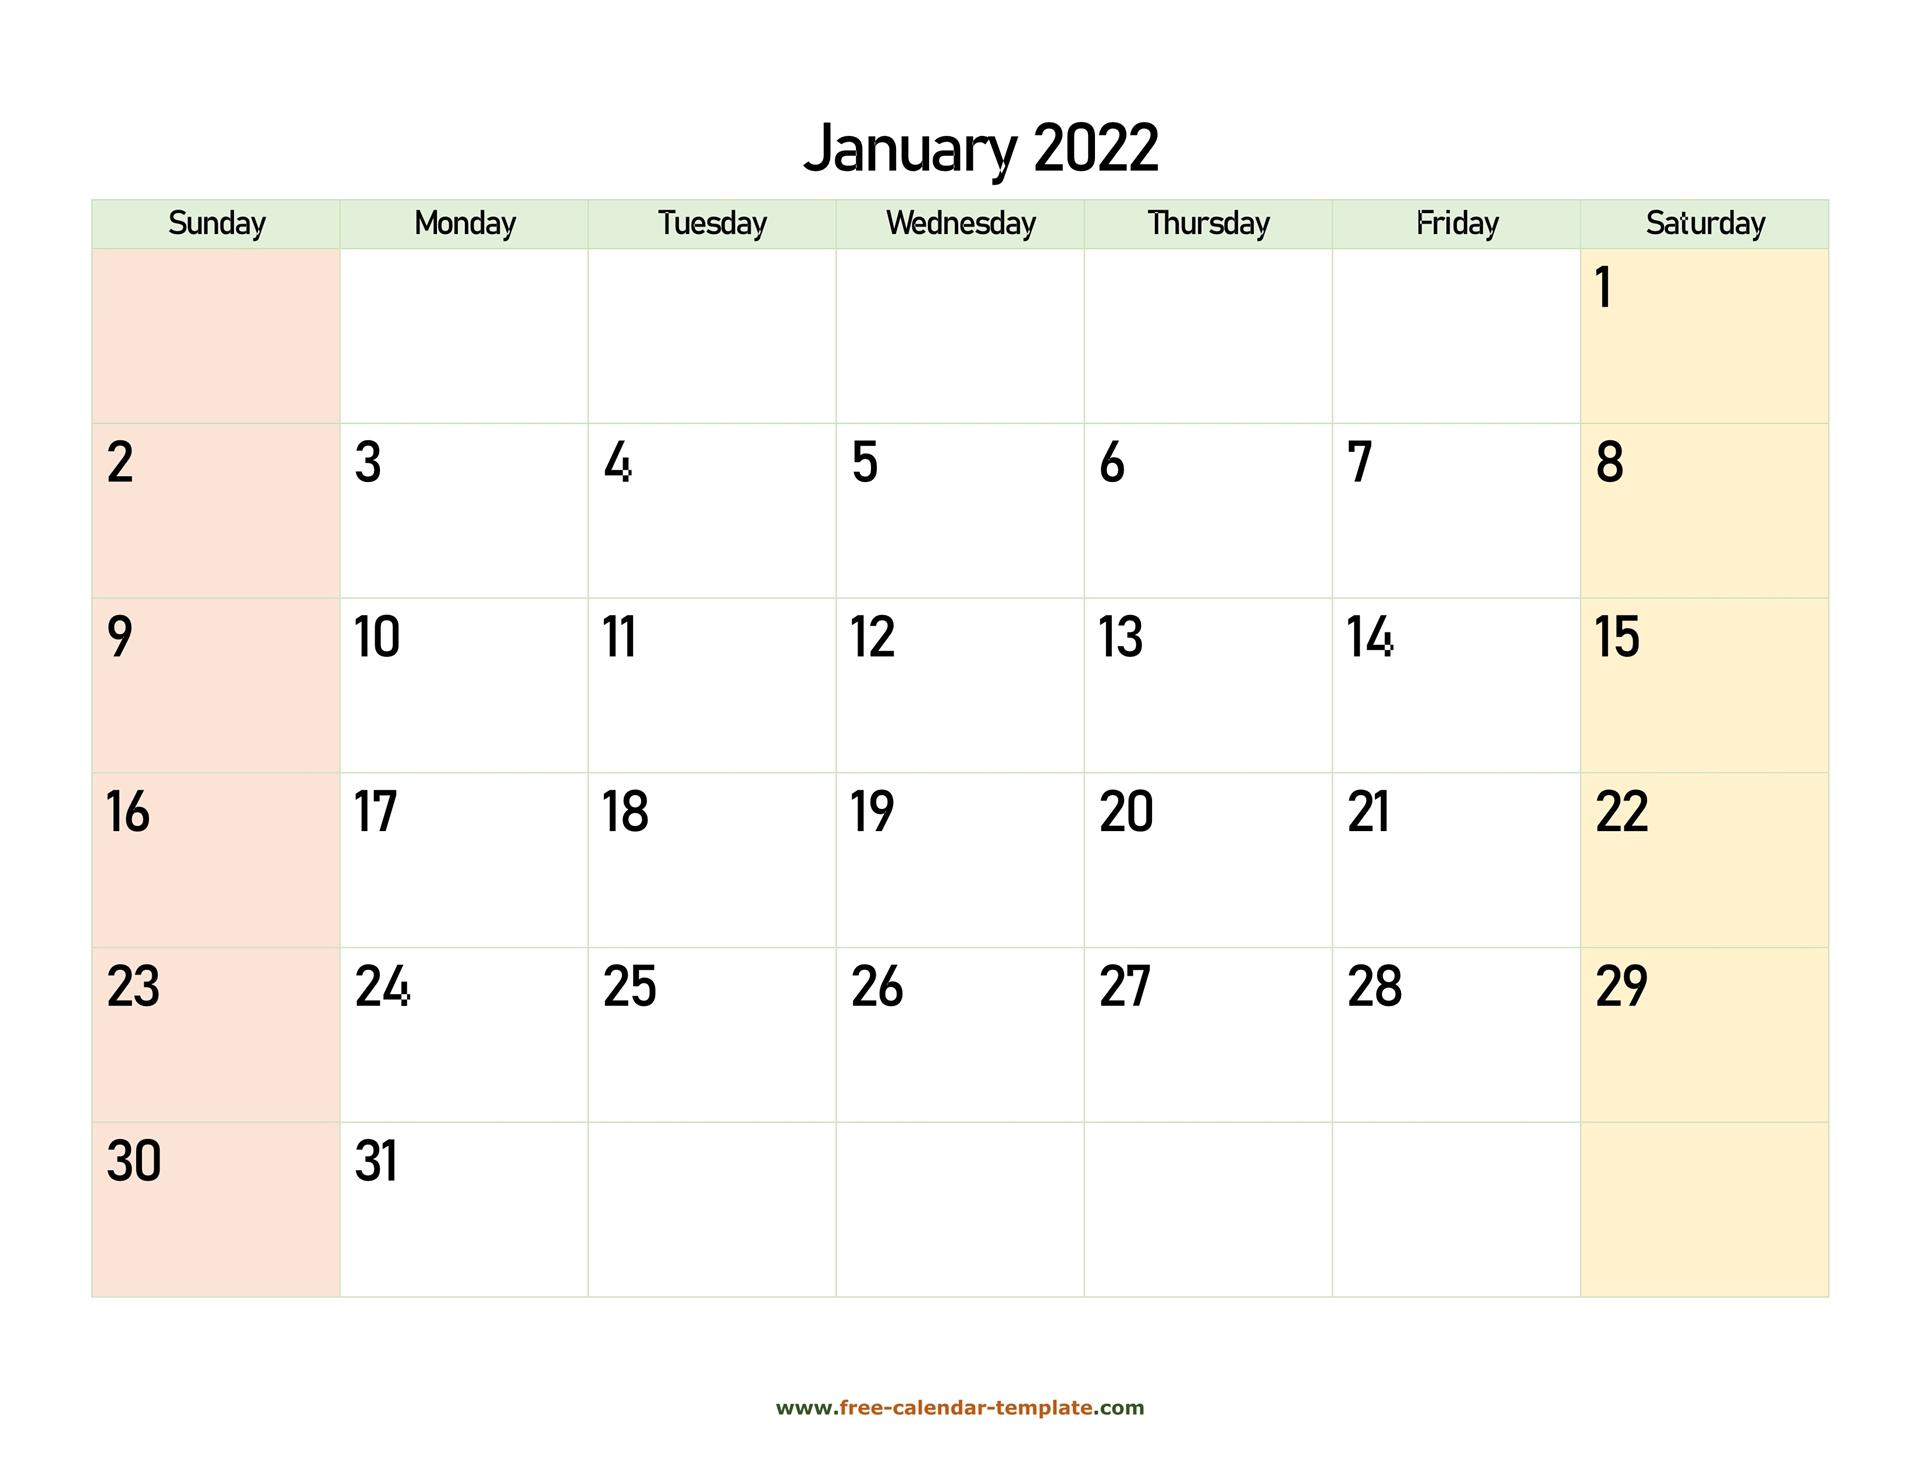 January 2022 Free Calendar Tempplate | Free Calendar Within January 2022 Calendar Printable Free